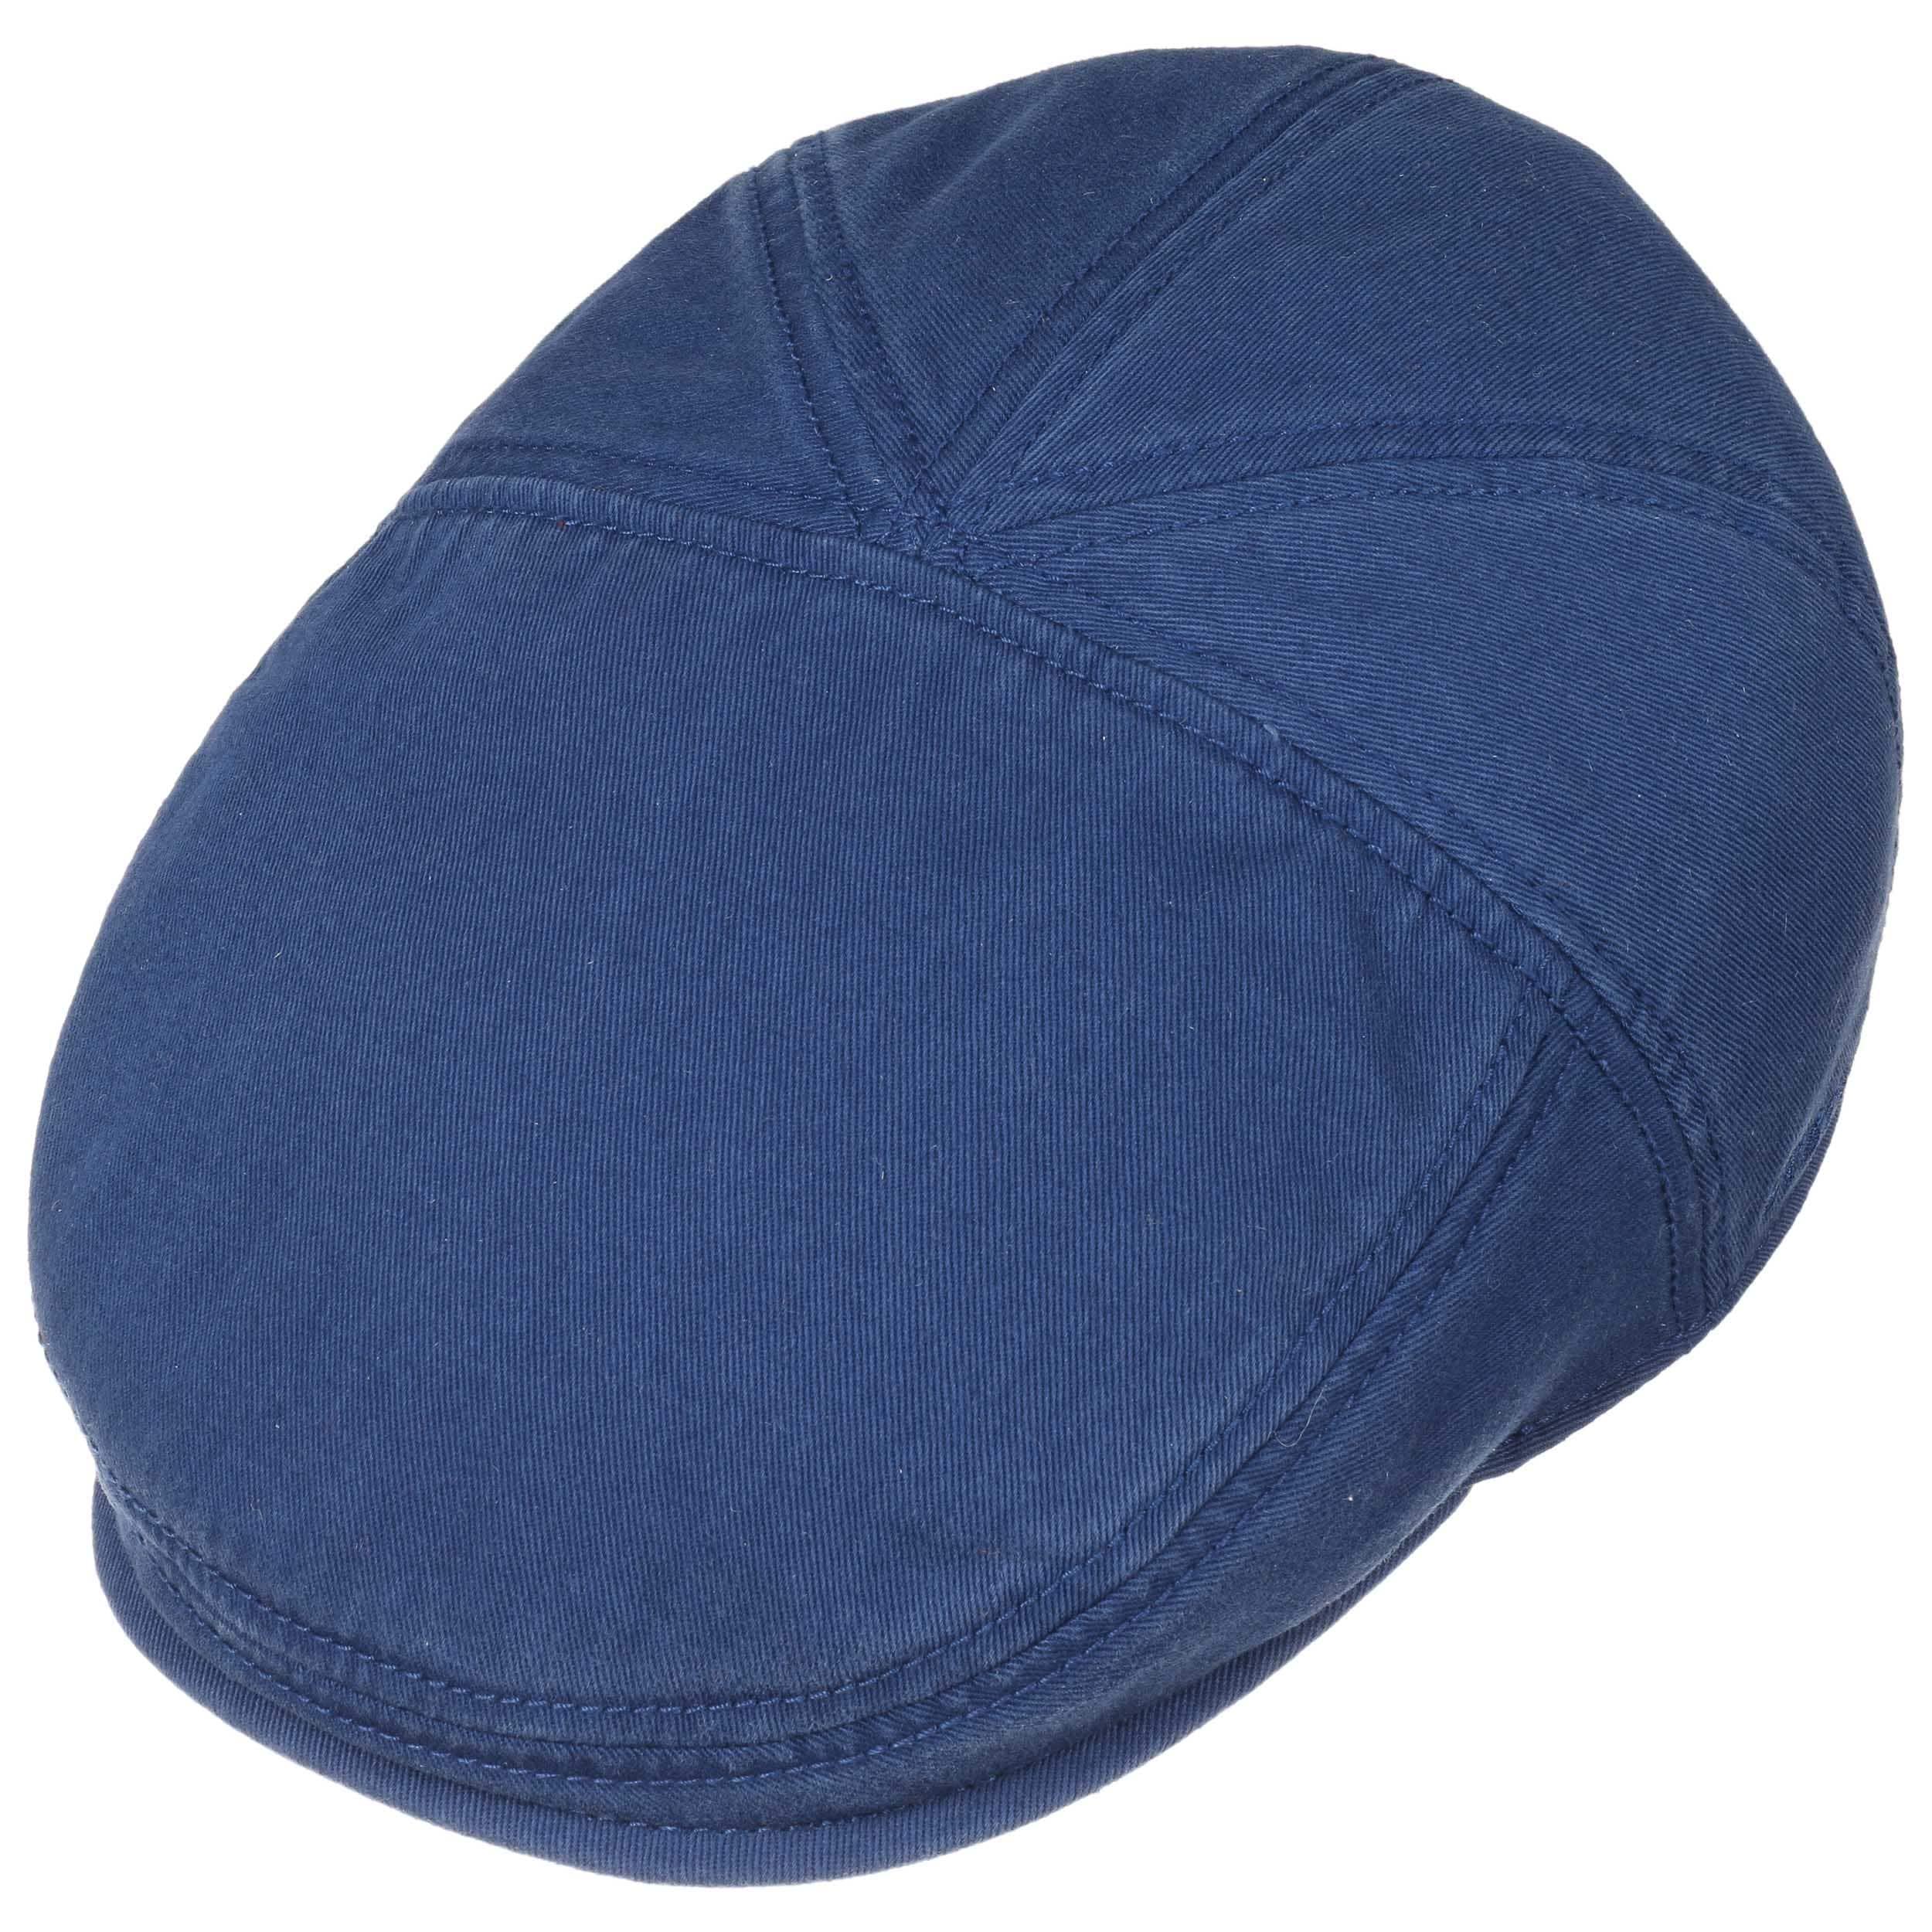 6f87446b ... Paradise Cotton Flat Cap by Stetson - royal-blue 1 ...